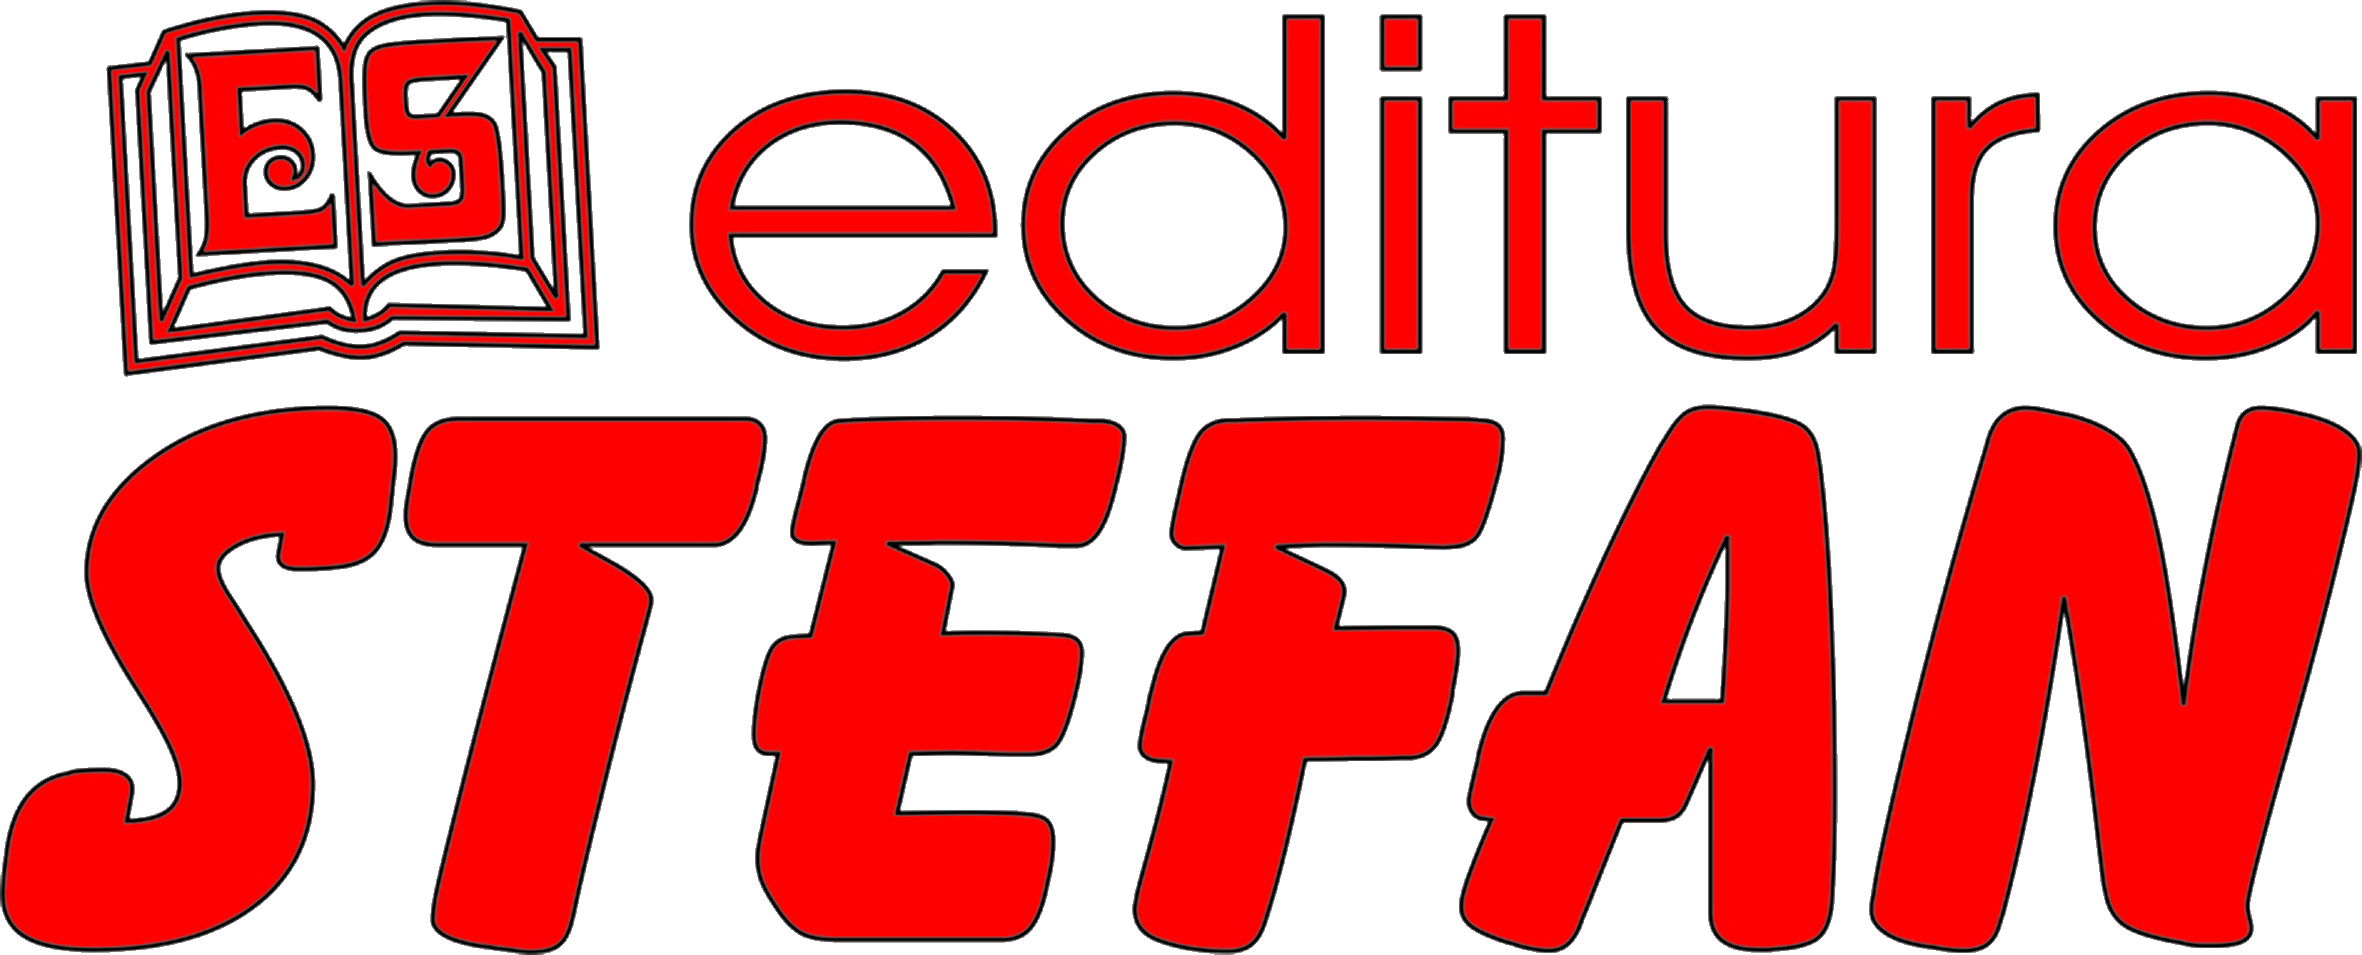 Editura Stefan